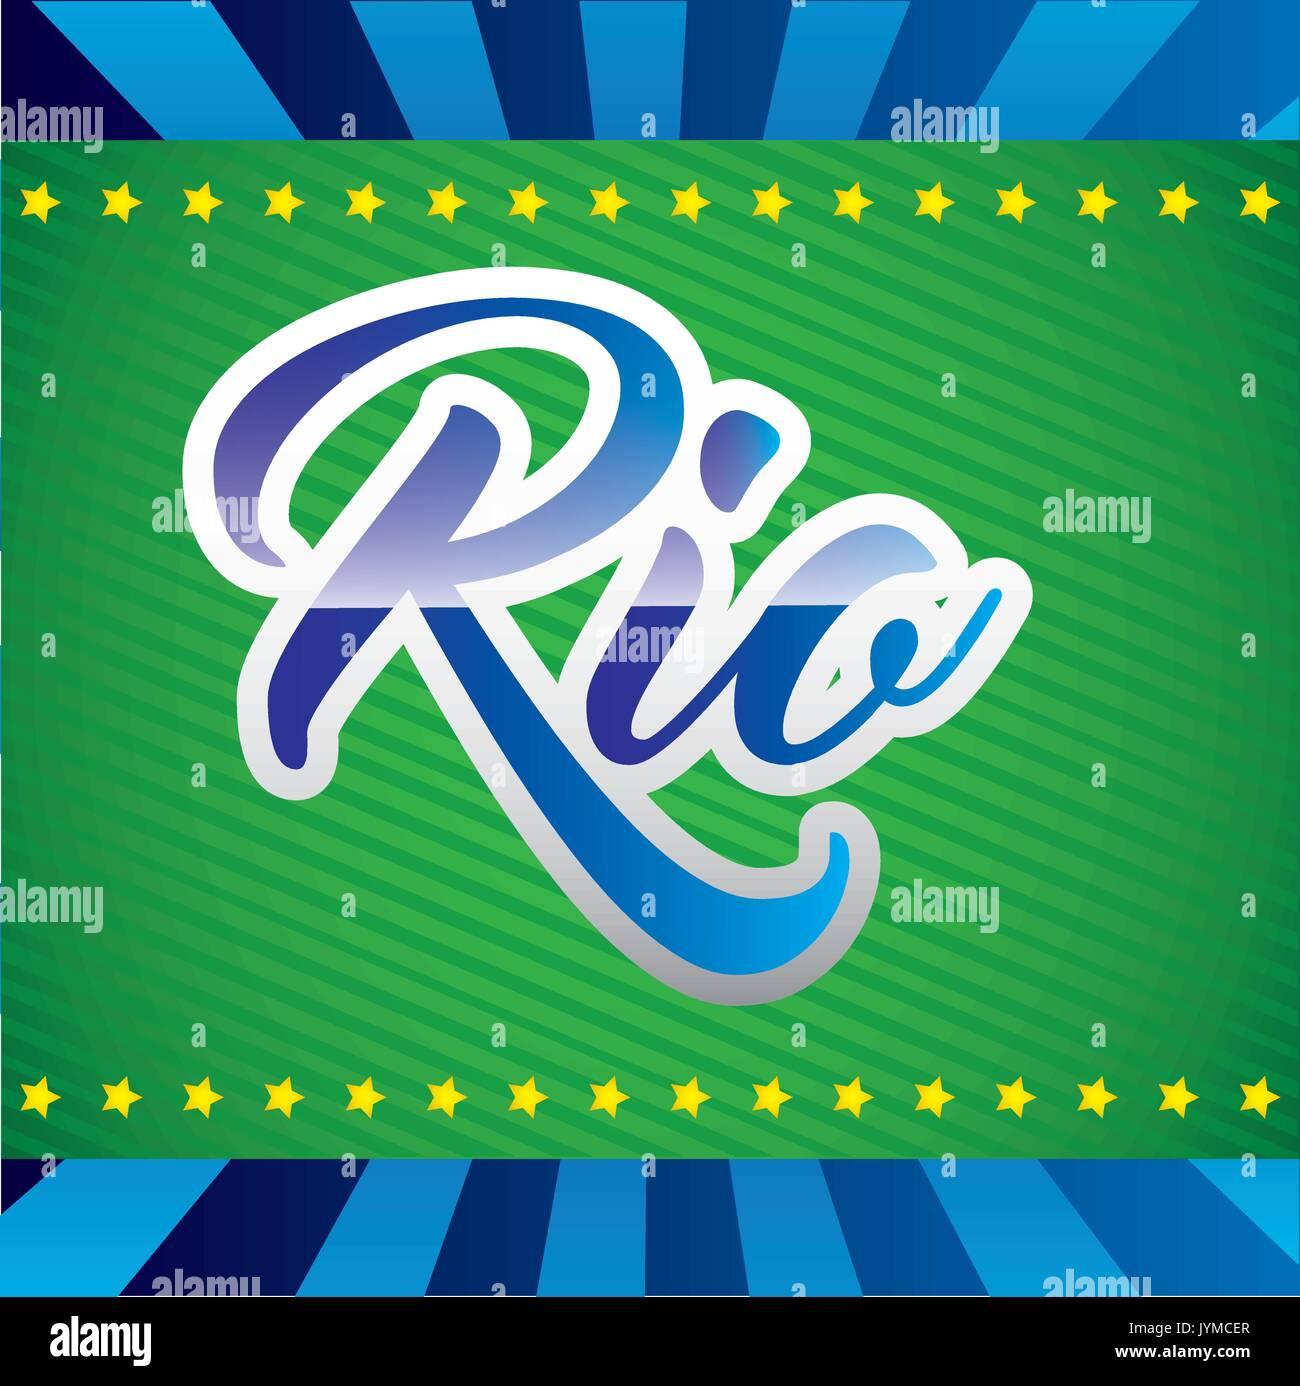 games rio design  vector illustration - Stock Vector